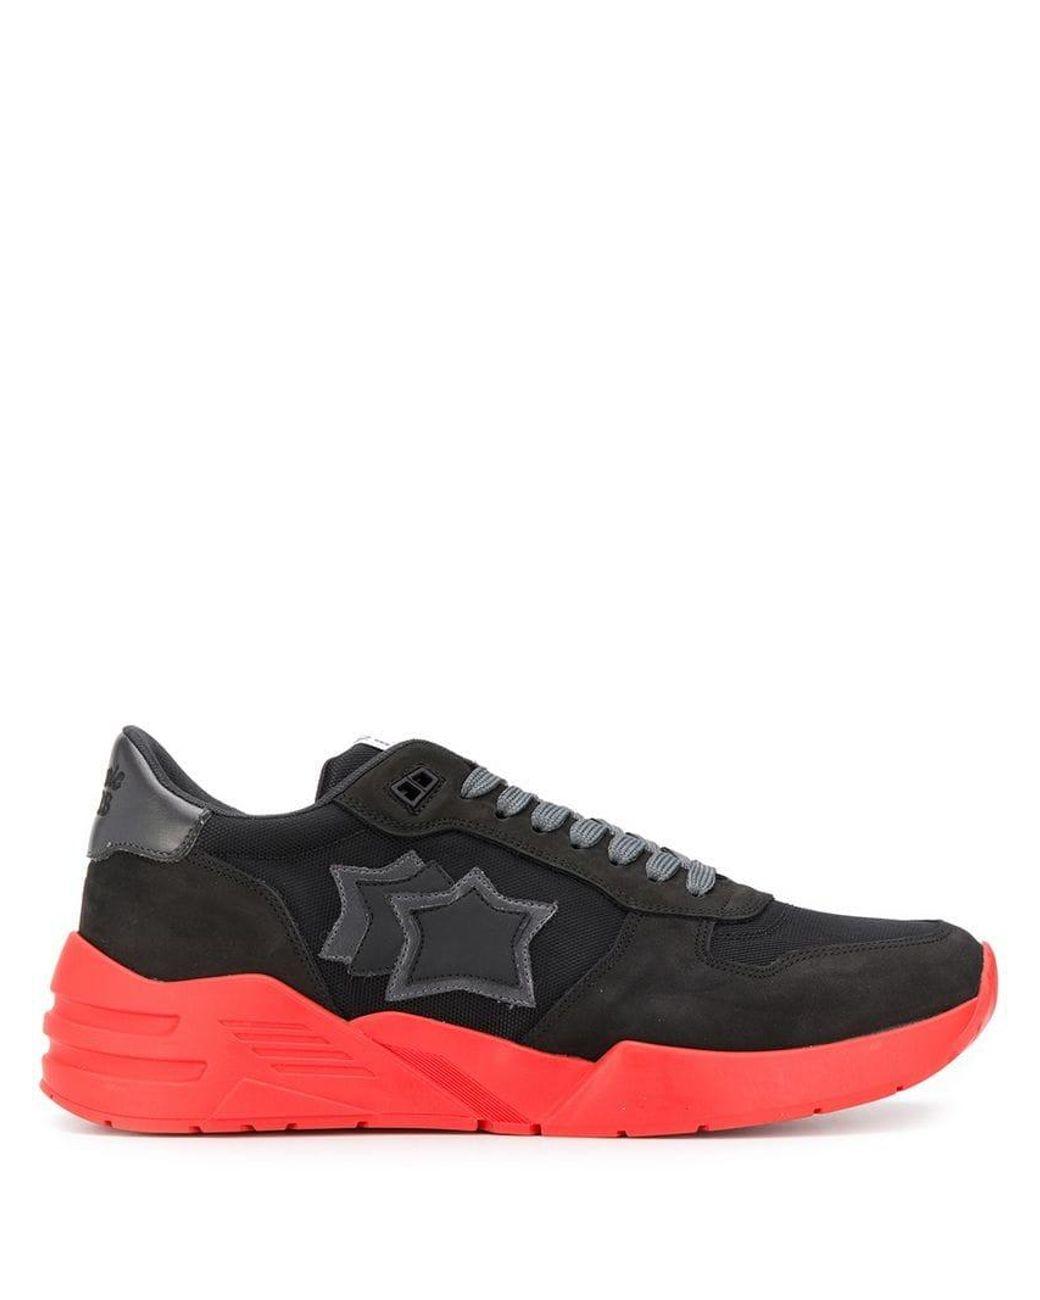 539bf5e03088c4 Lyst - Atlantic Stars Mars Sneakers in Black for Men